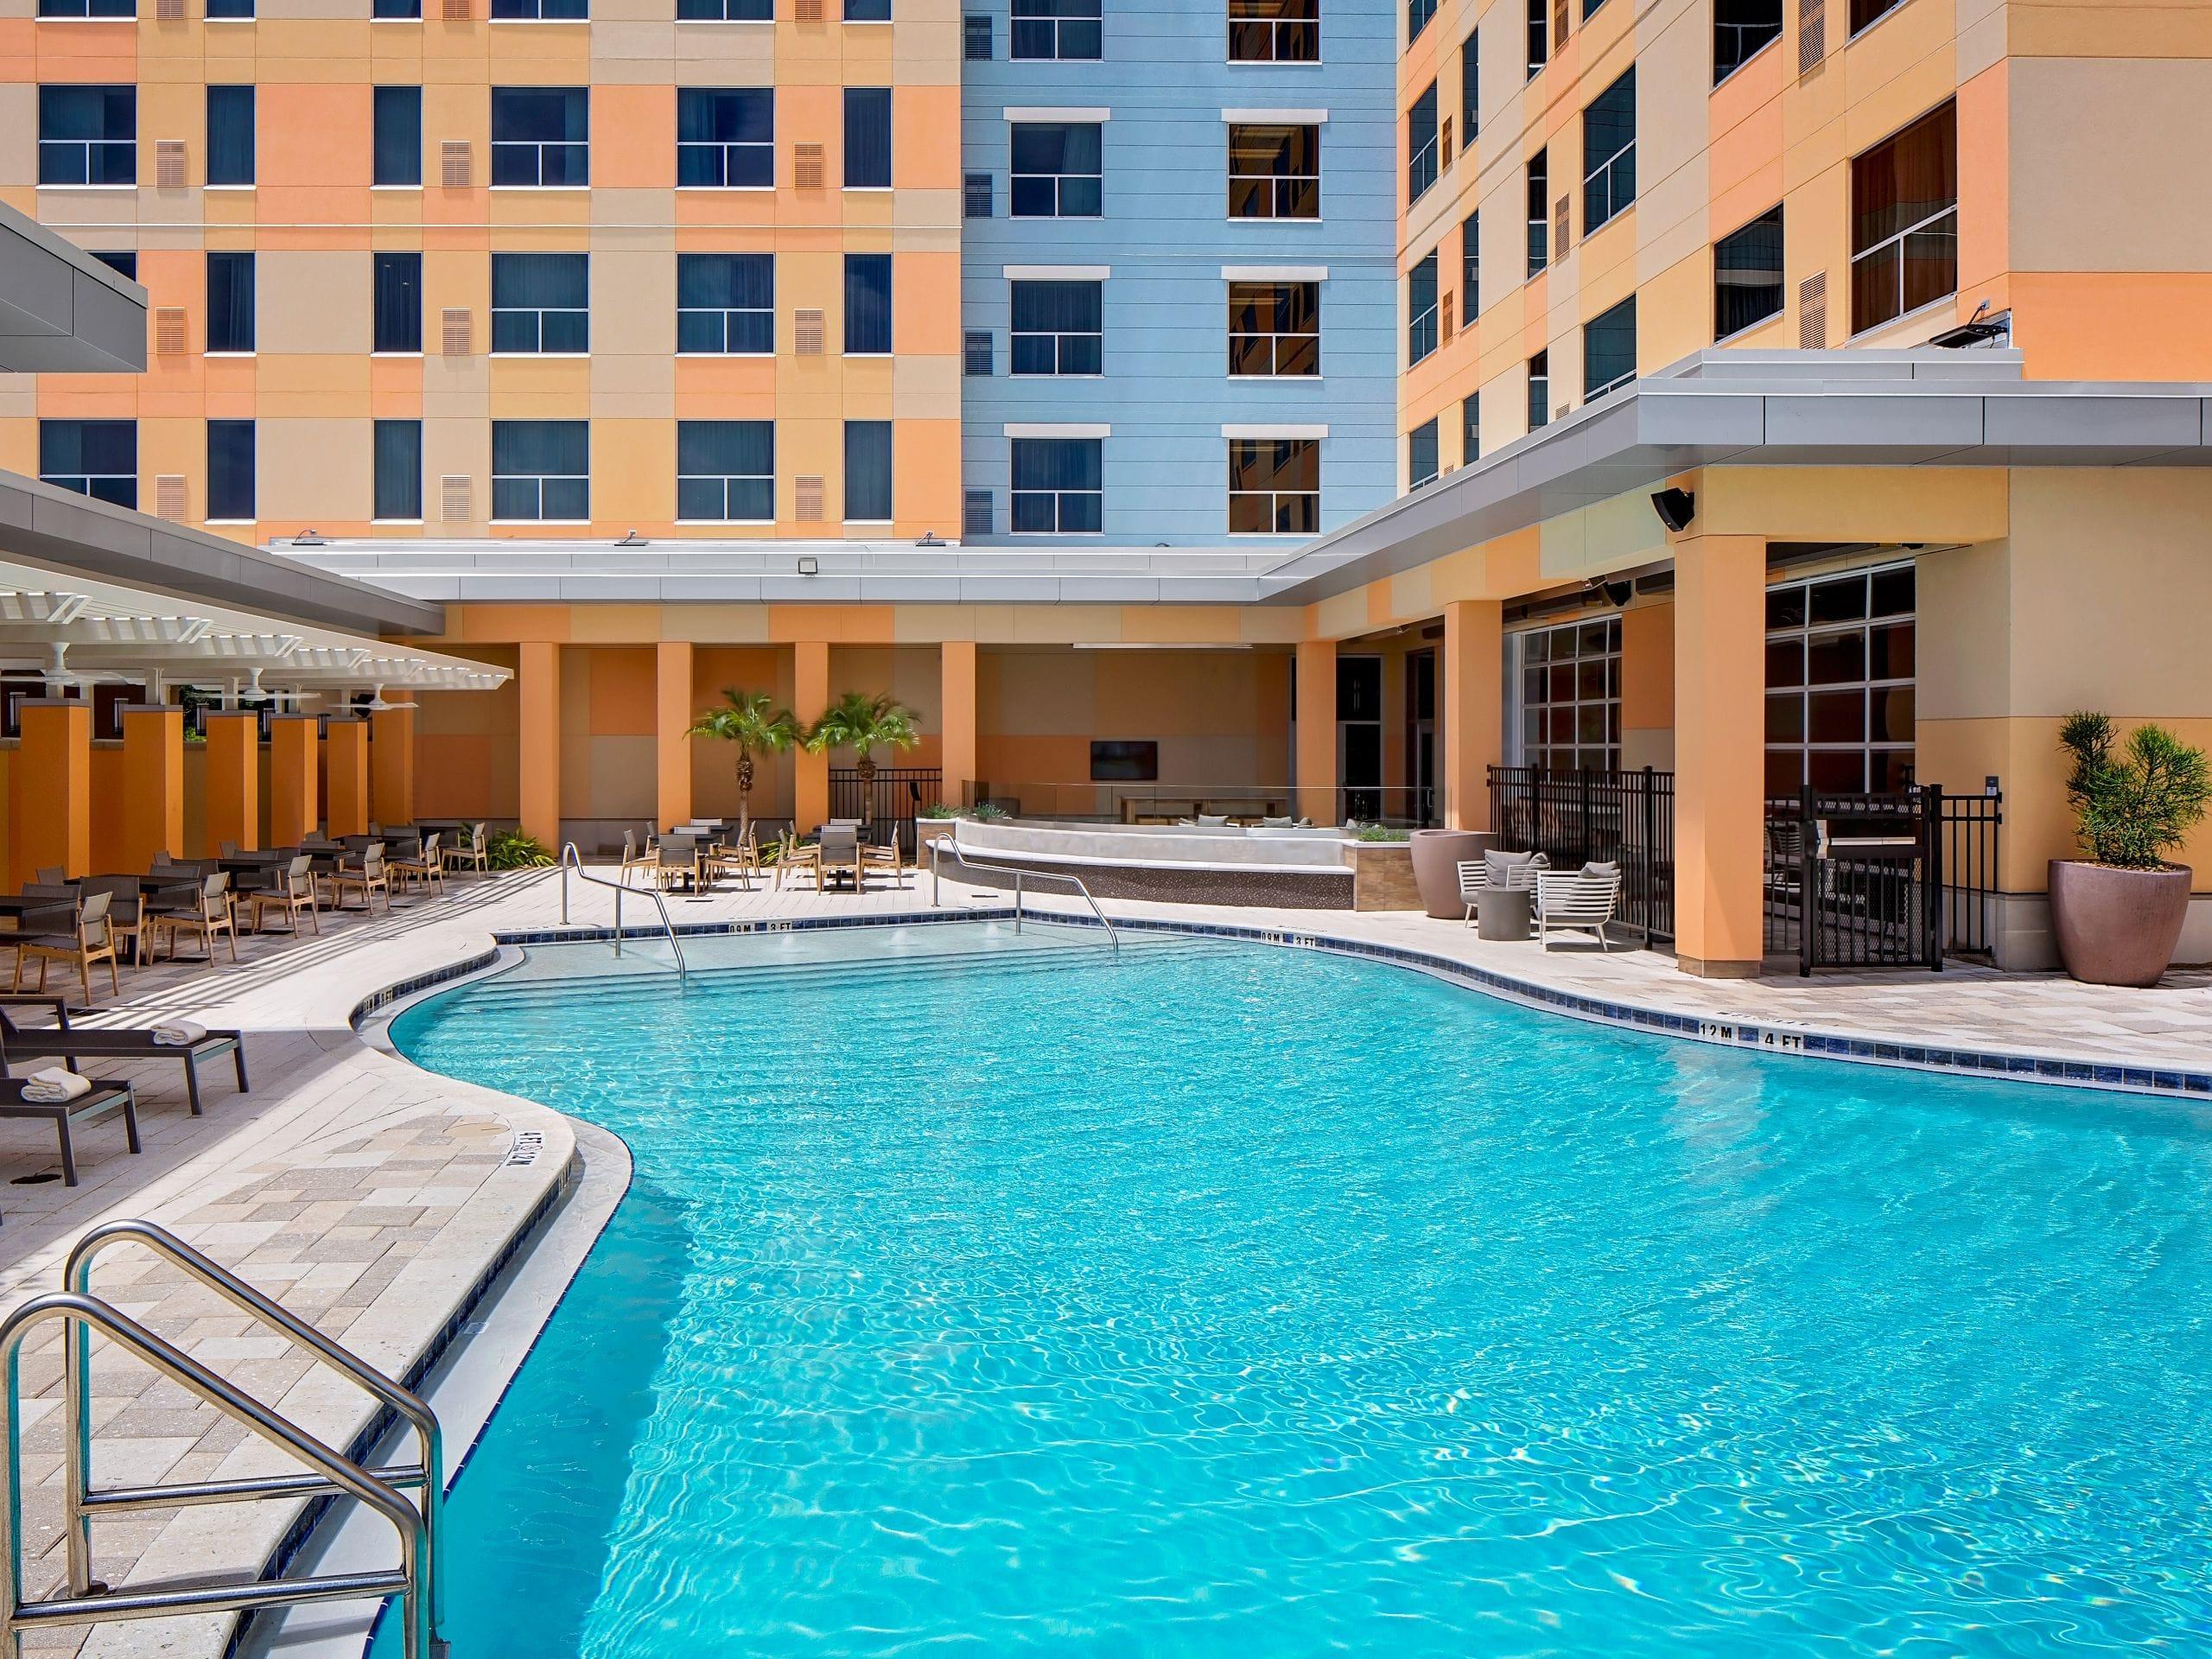 Extended Stay Hotel near Universal Orlando Resort™ | Hyatt House ...